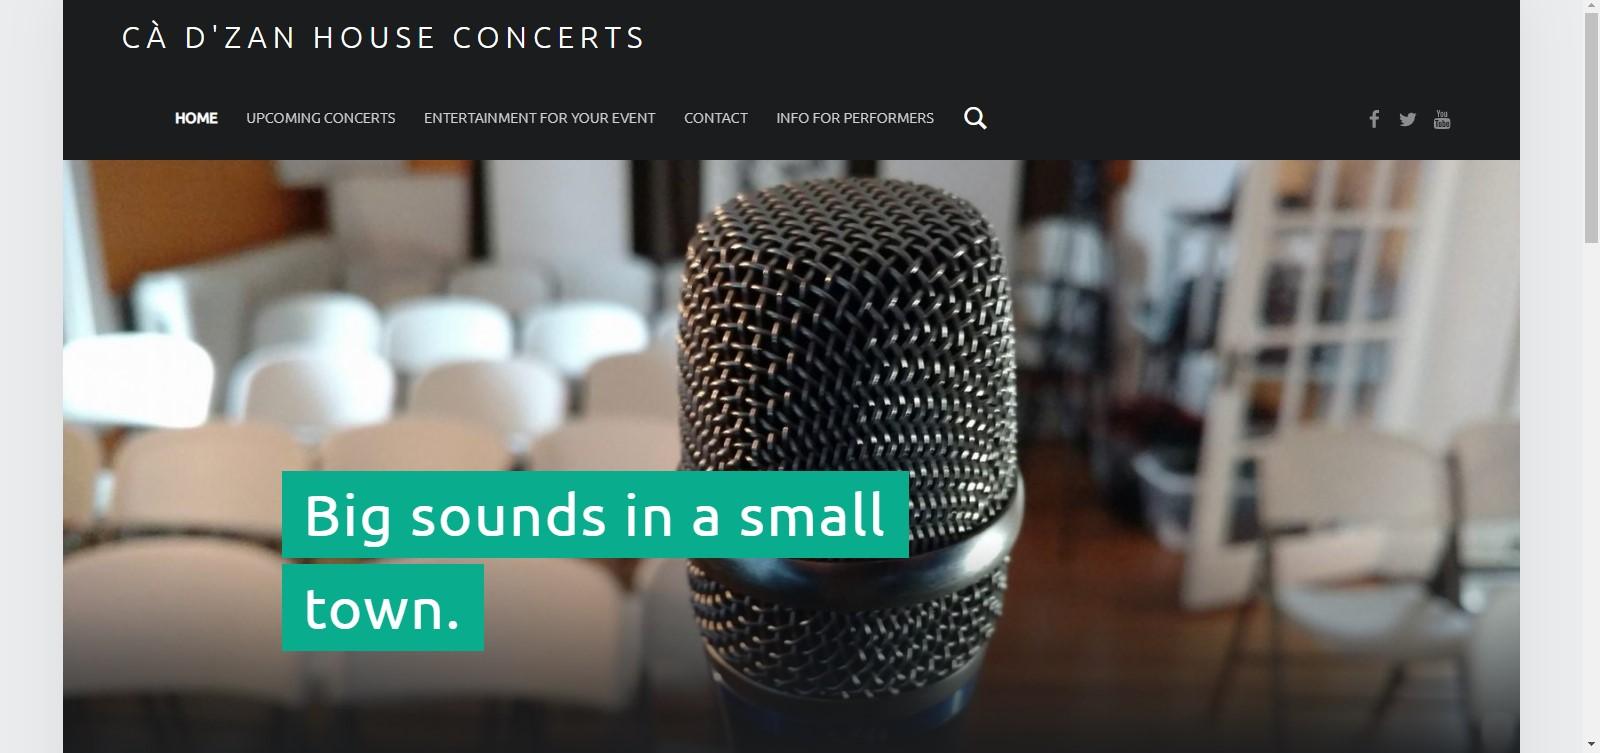 Cà d'Zan House Concerts